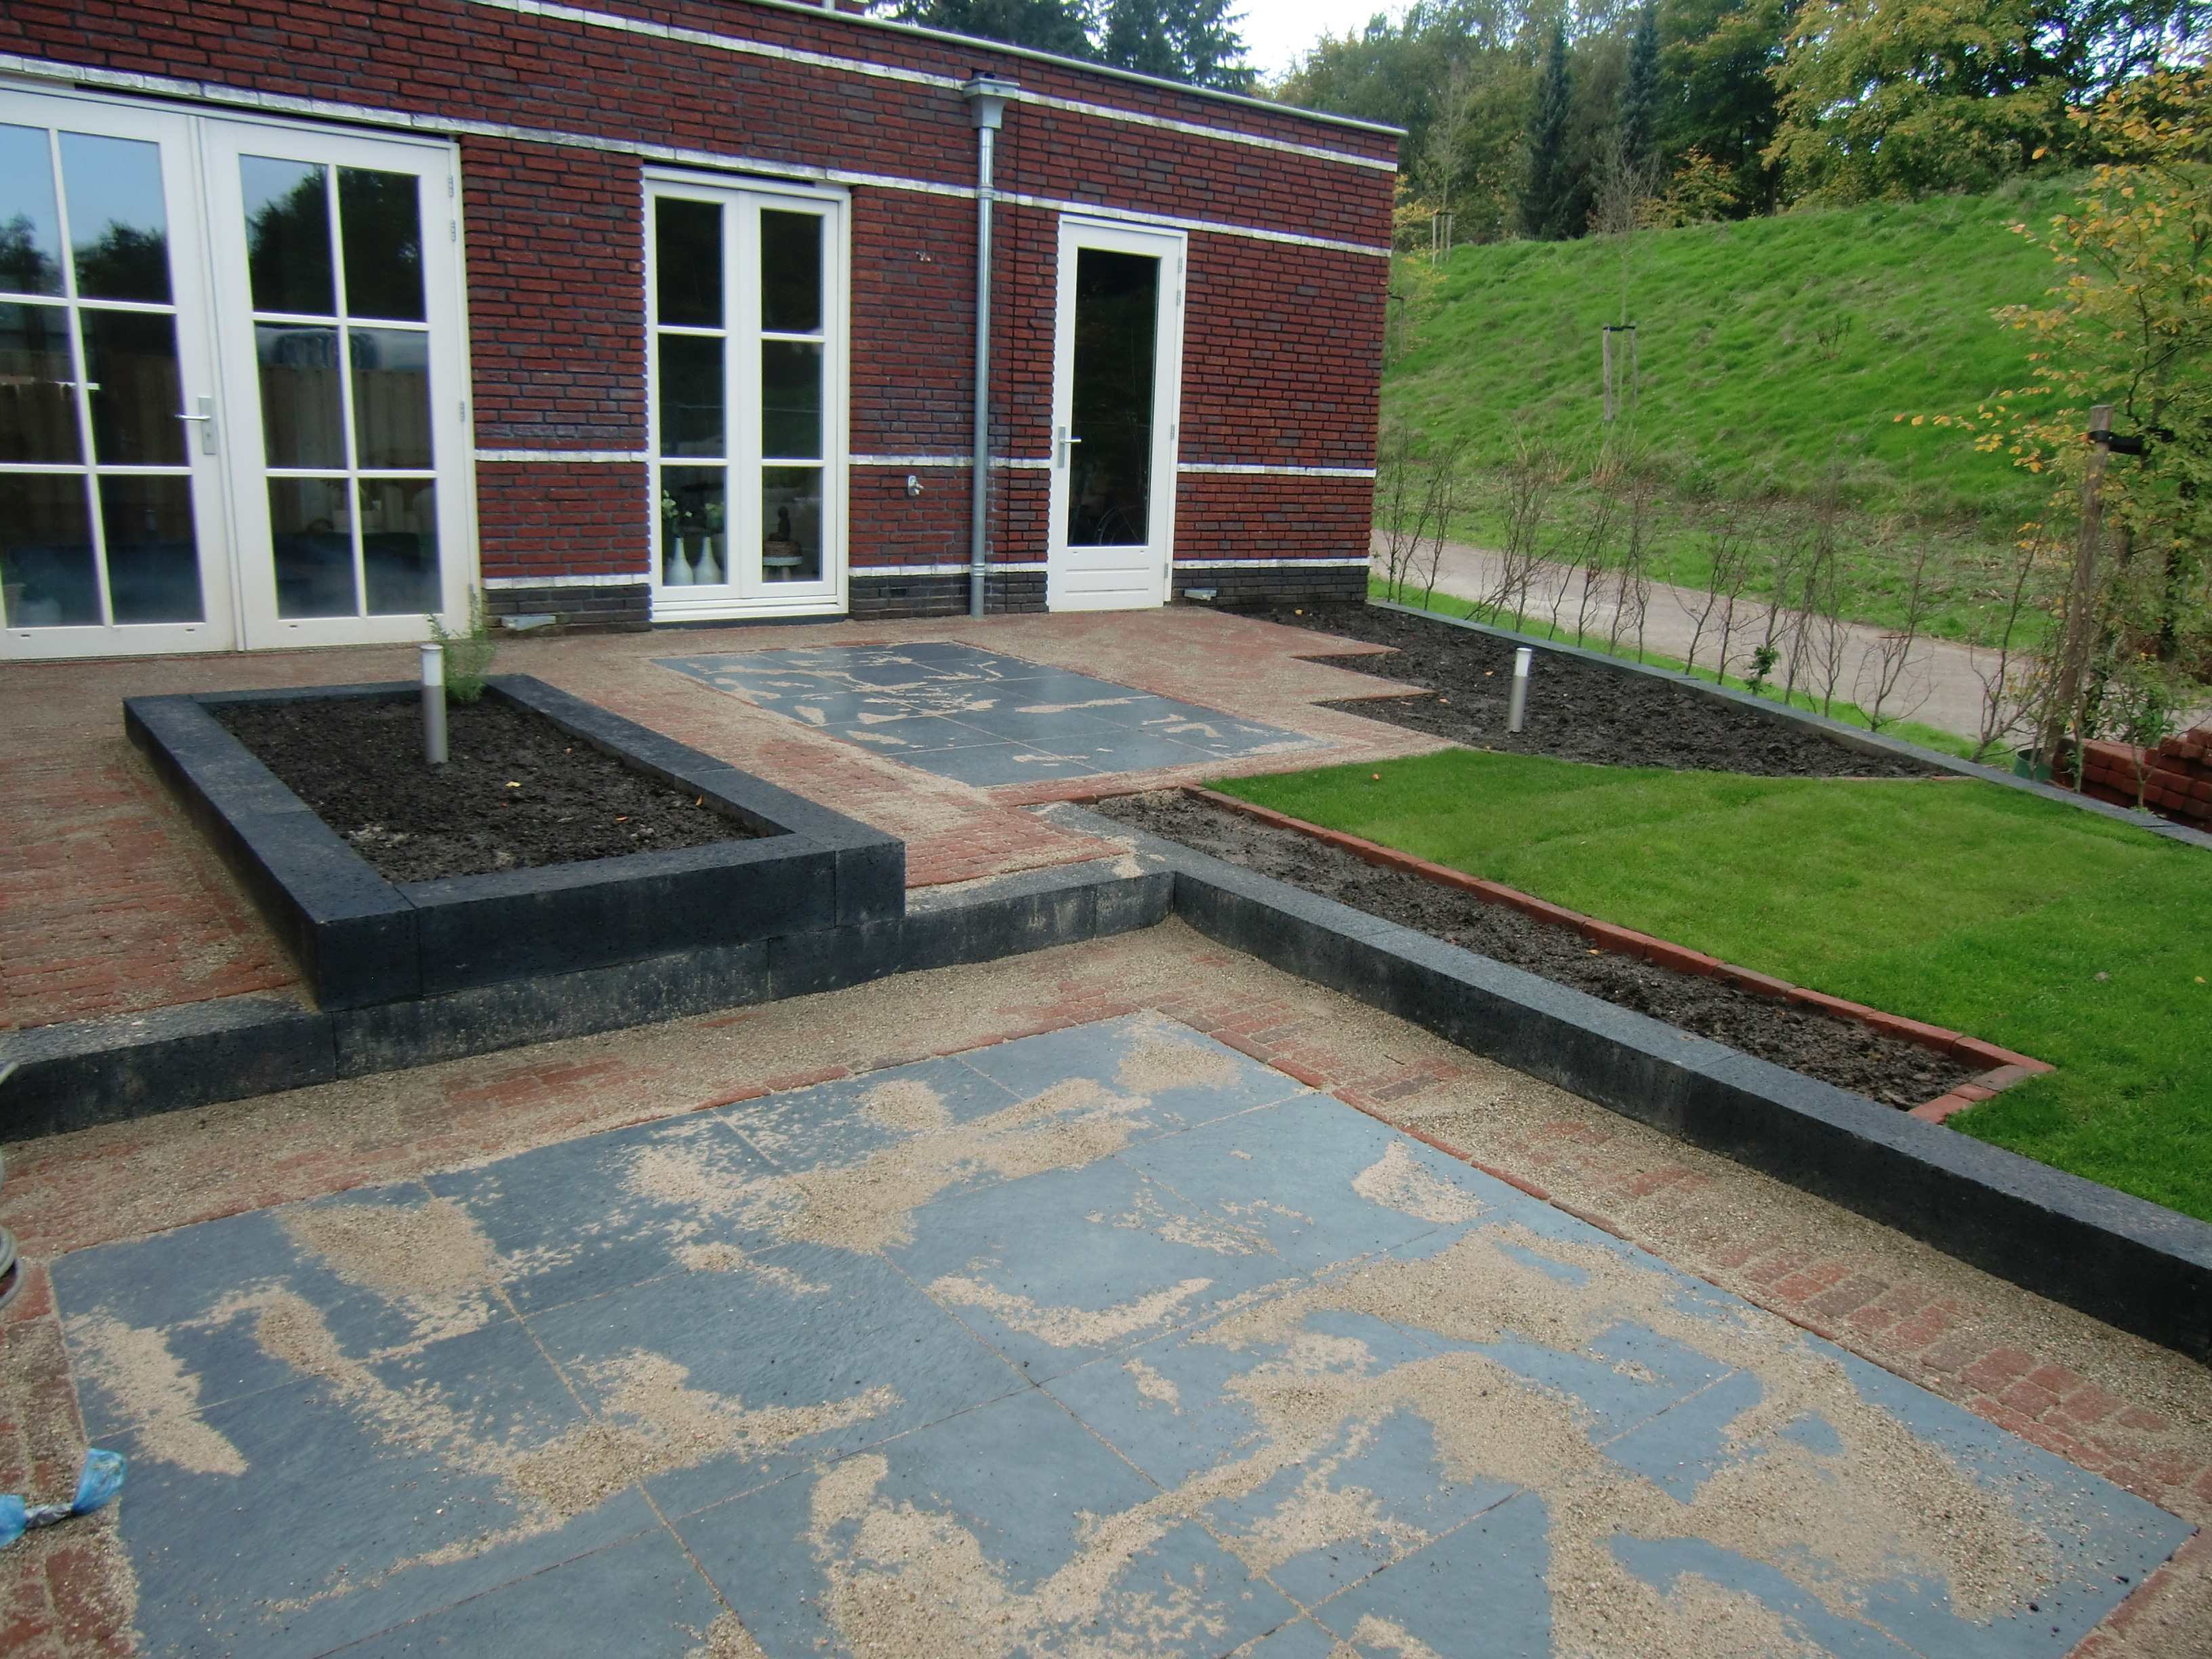 Uw tuin hoveniers hoveniernederland for Klein tuin uitleg